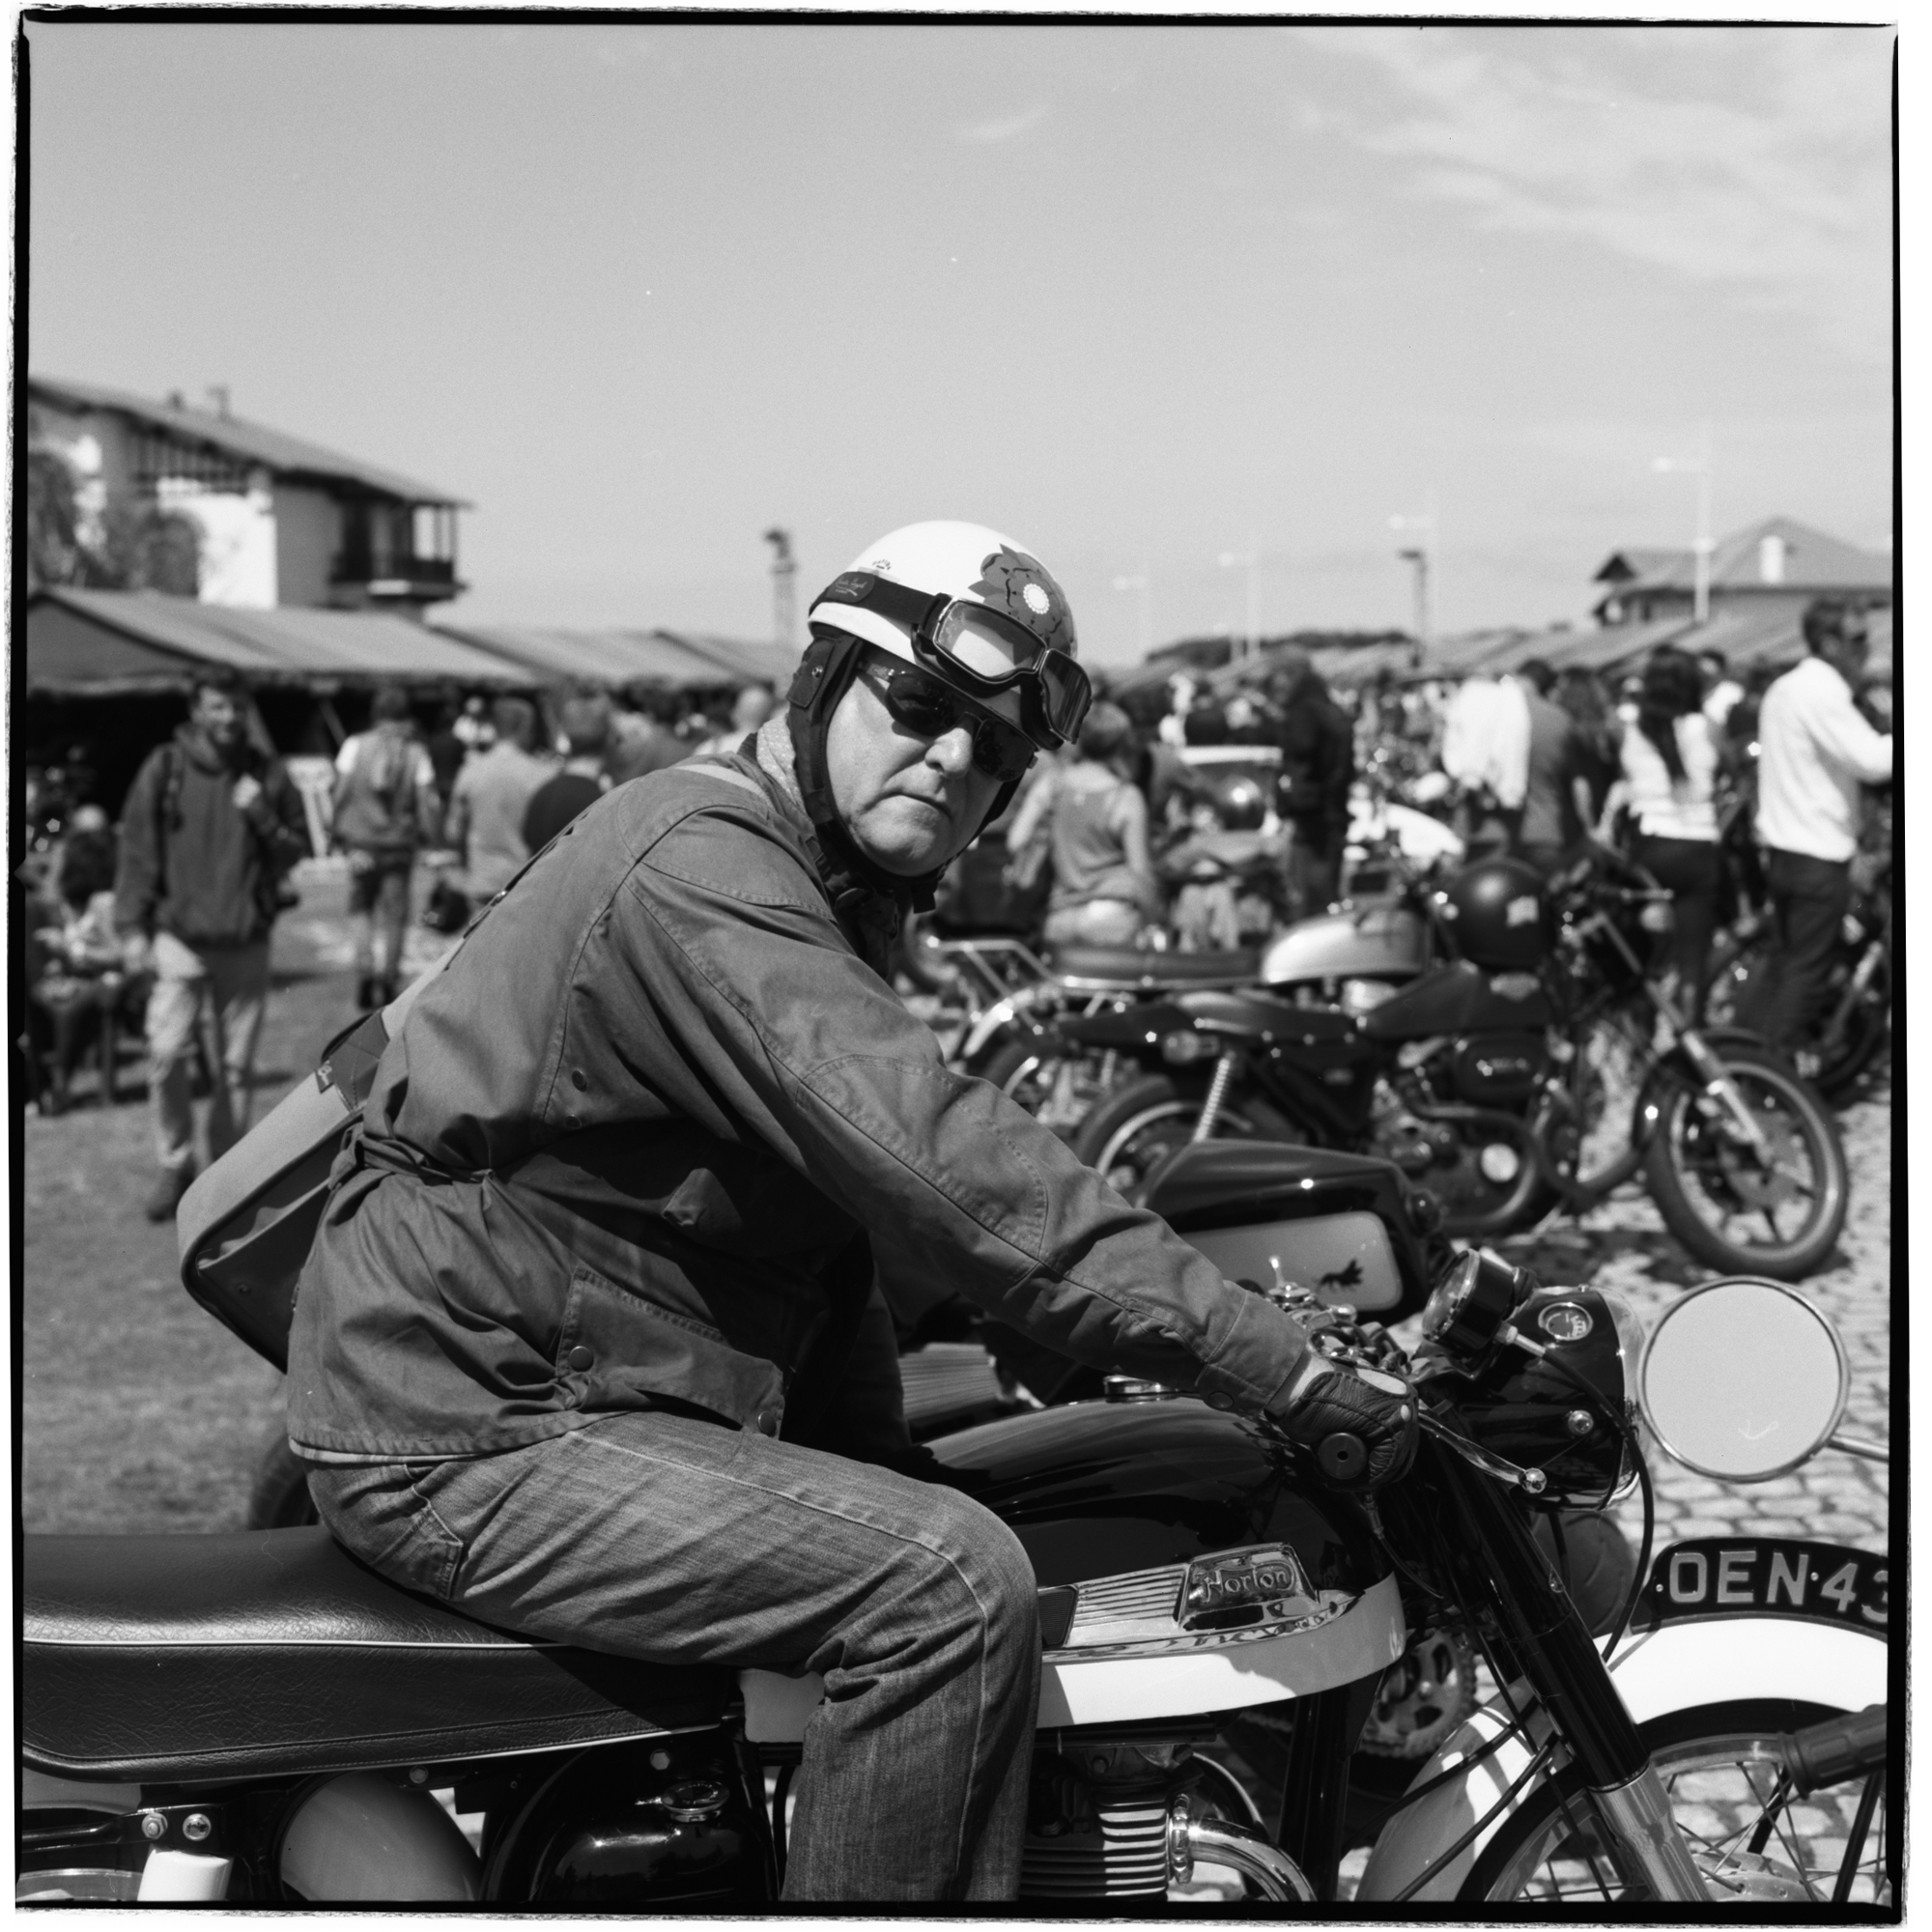 Grant Smith - Biker